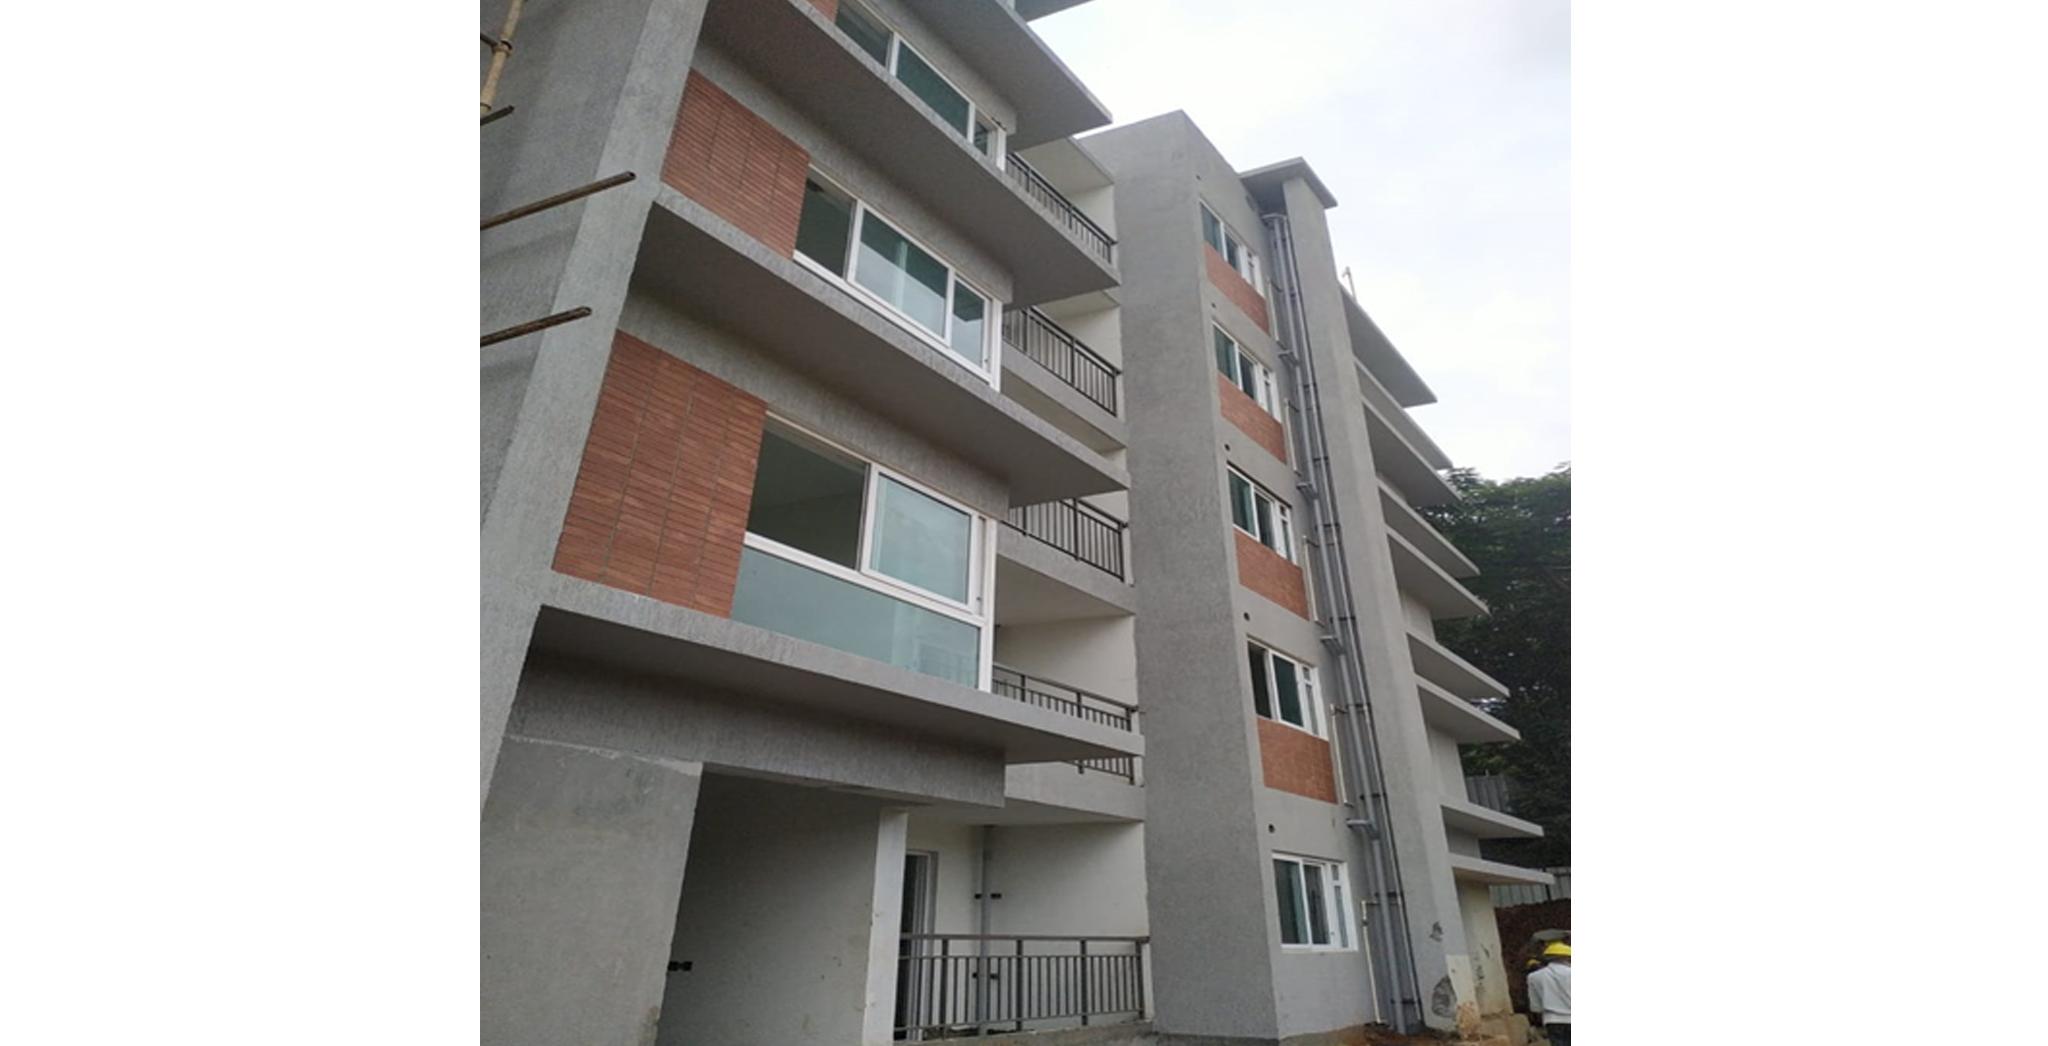 Aug 2021 - H Block: South Elevation